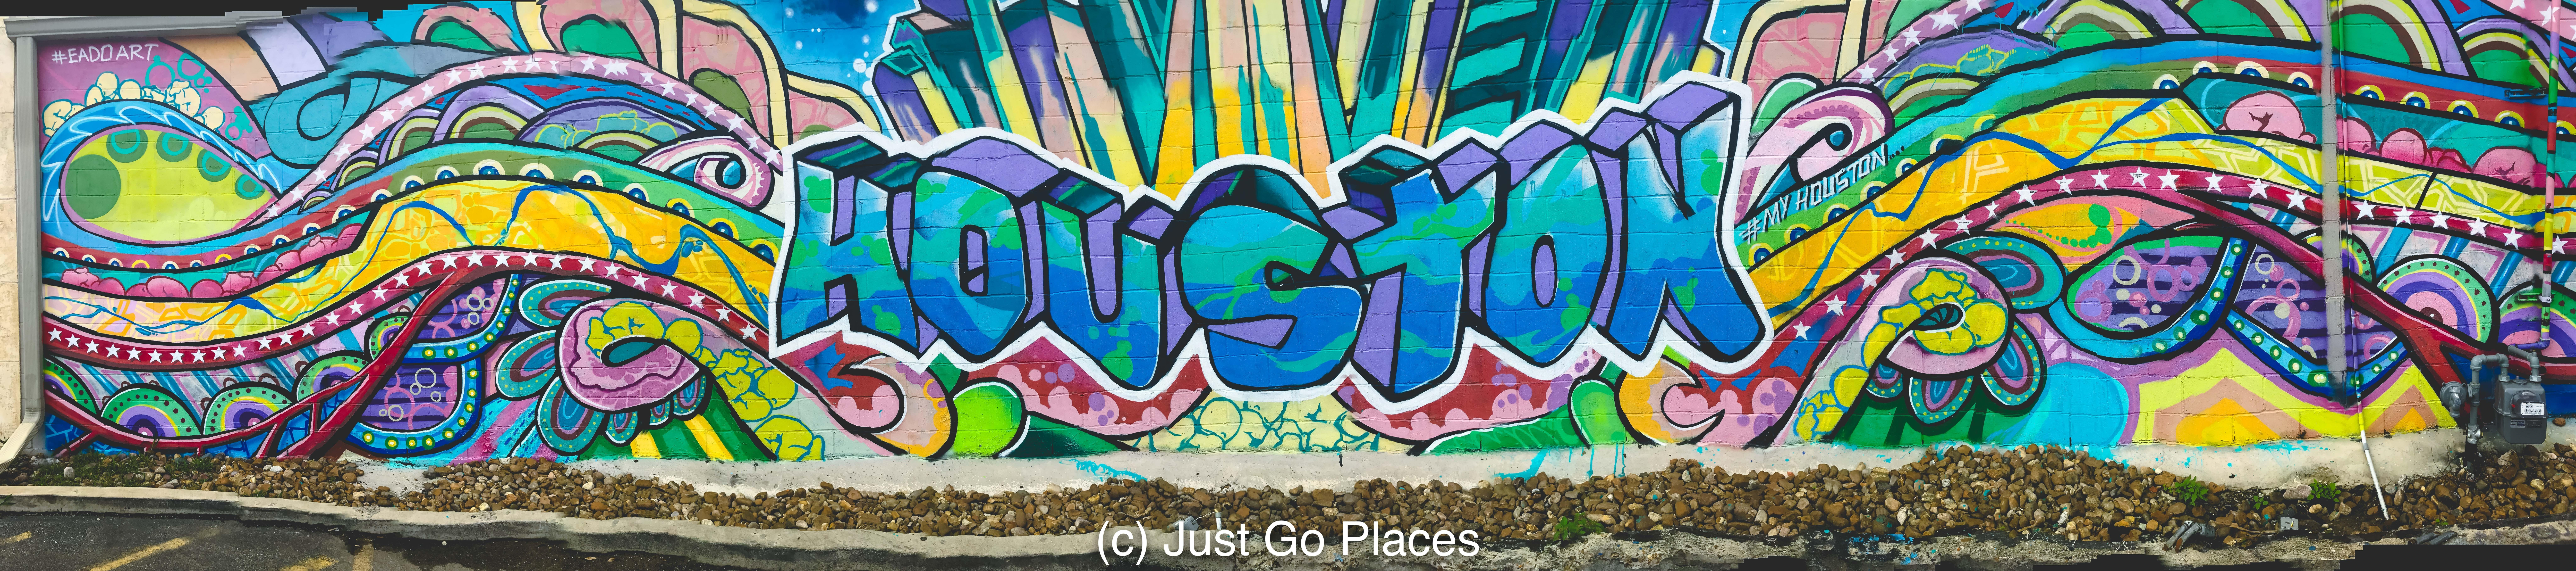 Houston Wall Murals Regarding 2017 Houston Wall Art (View 11 of 20)